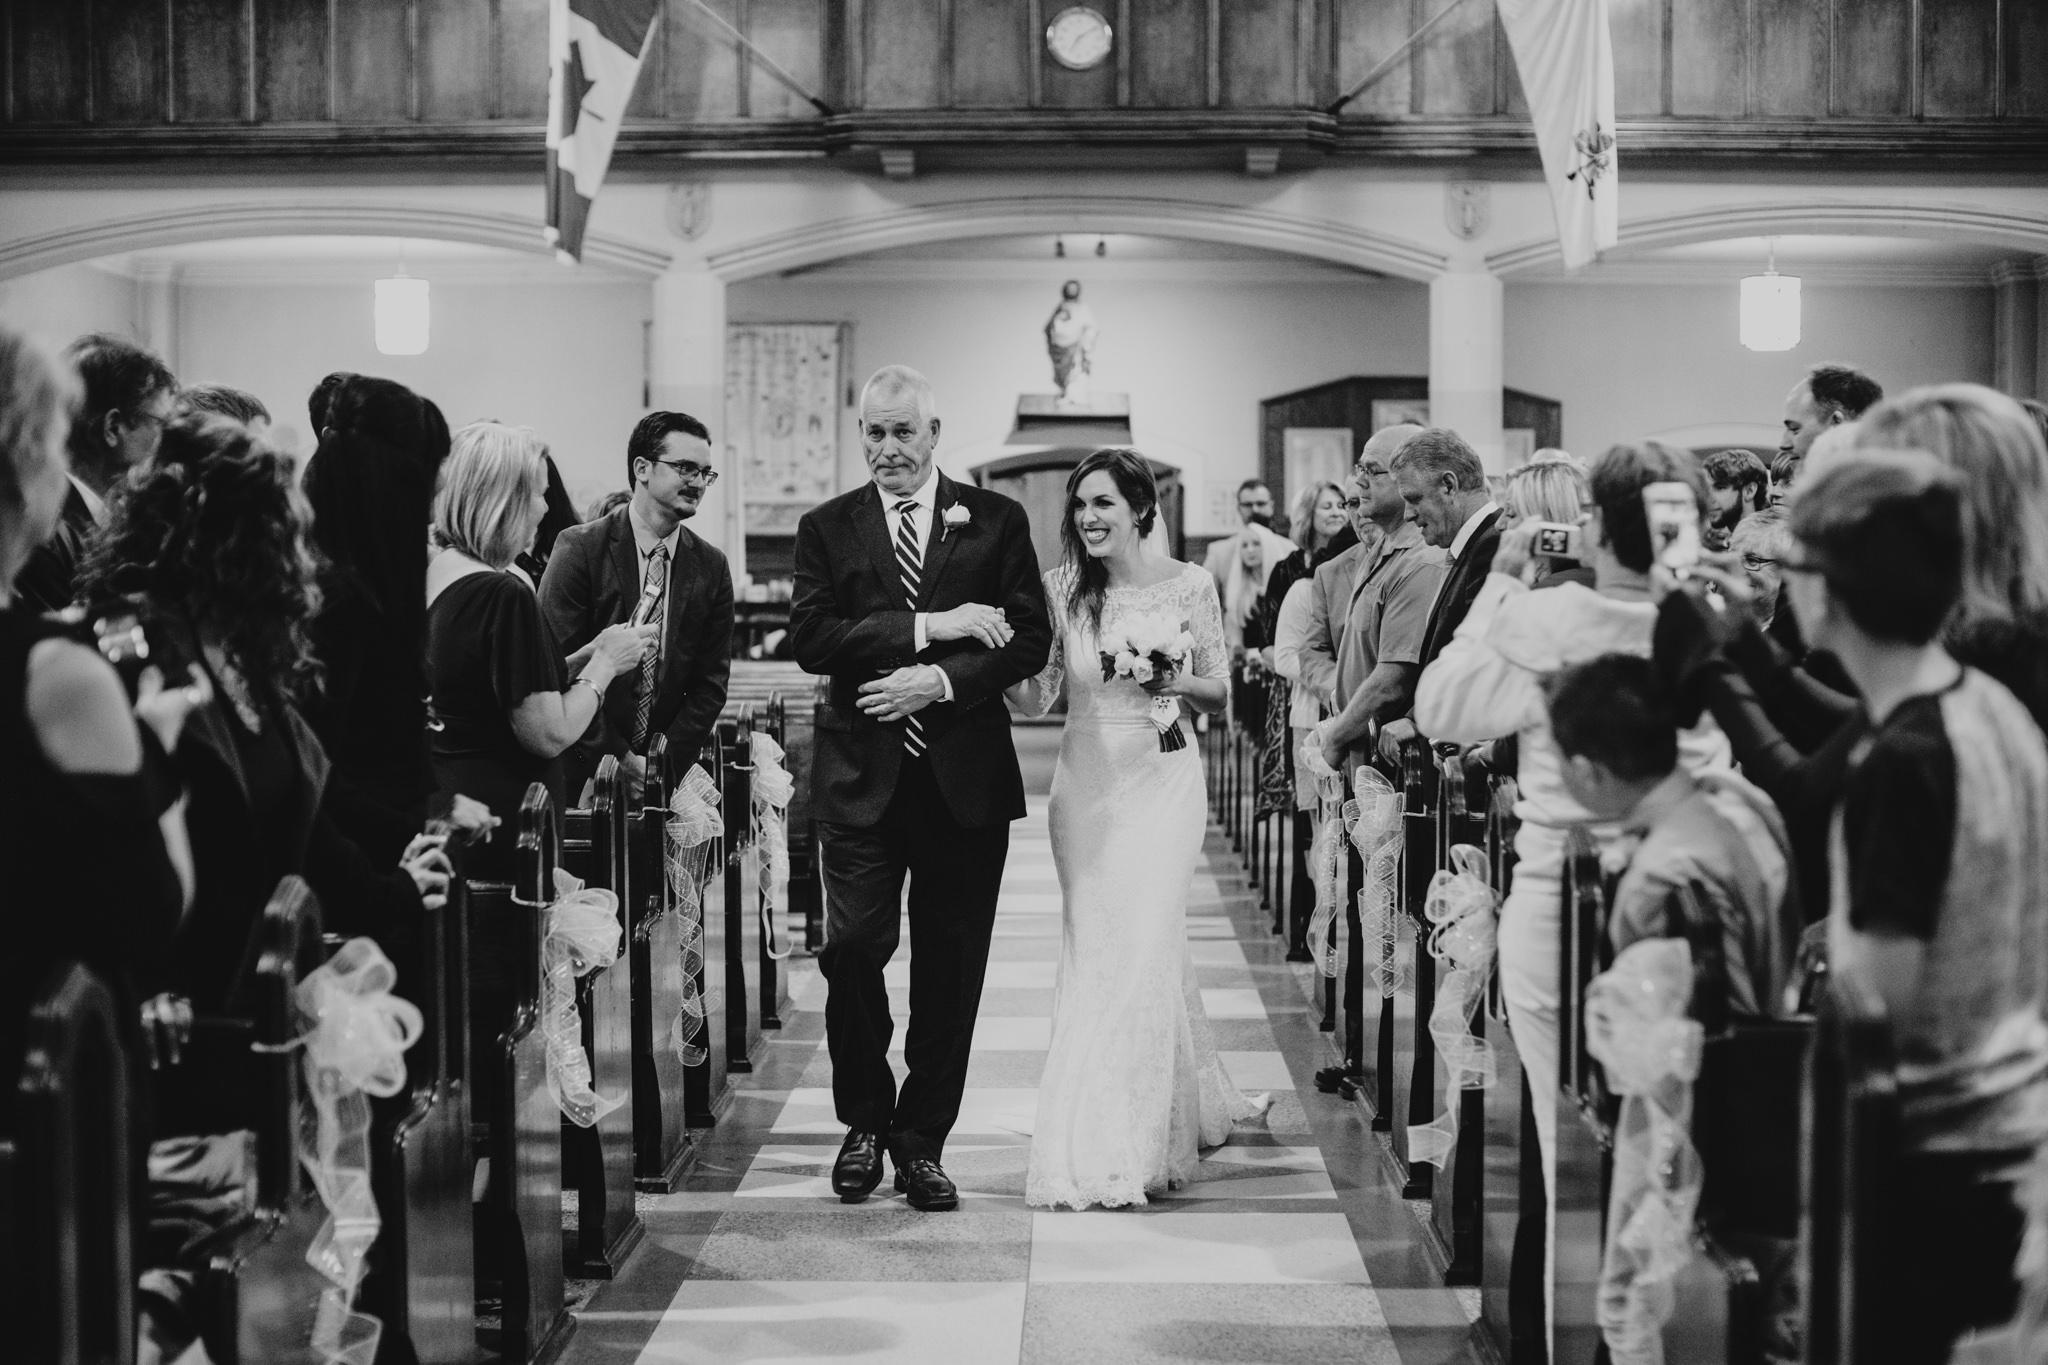 391-WEB-Jonathan-Kuhn-Photography-Stephanie-Cameron-Wedding-7612_mini.jpg